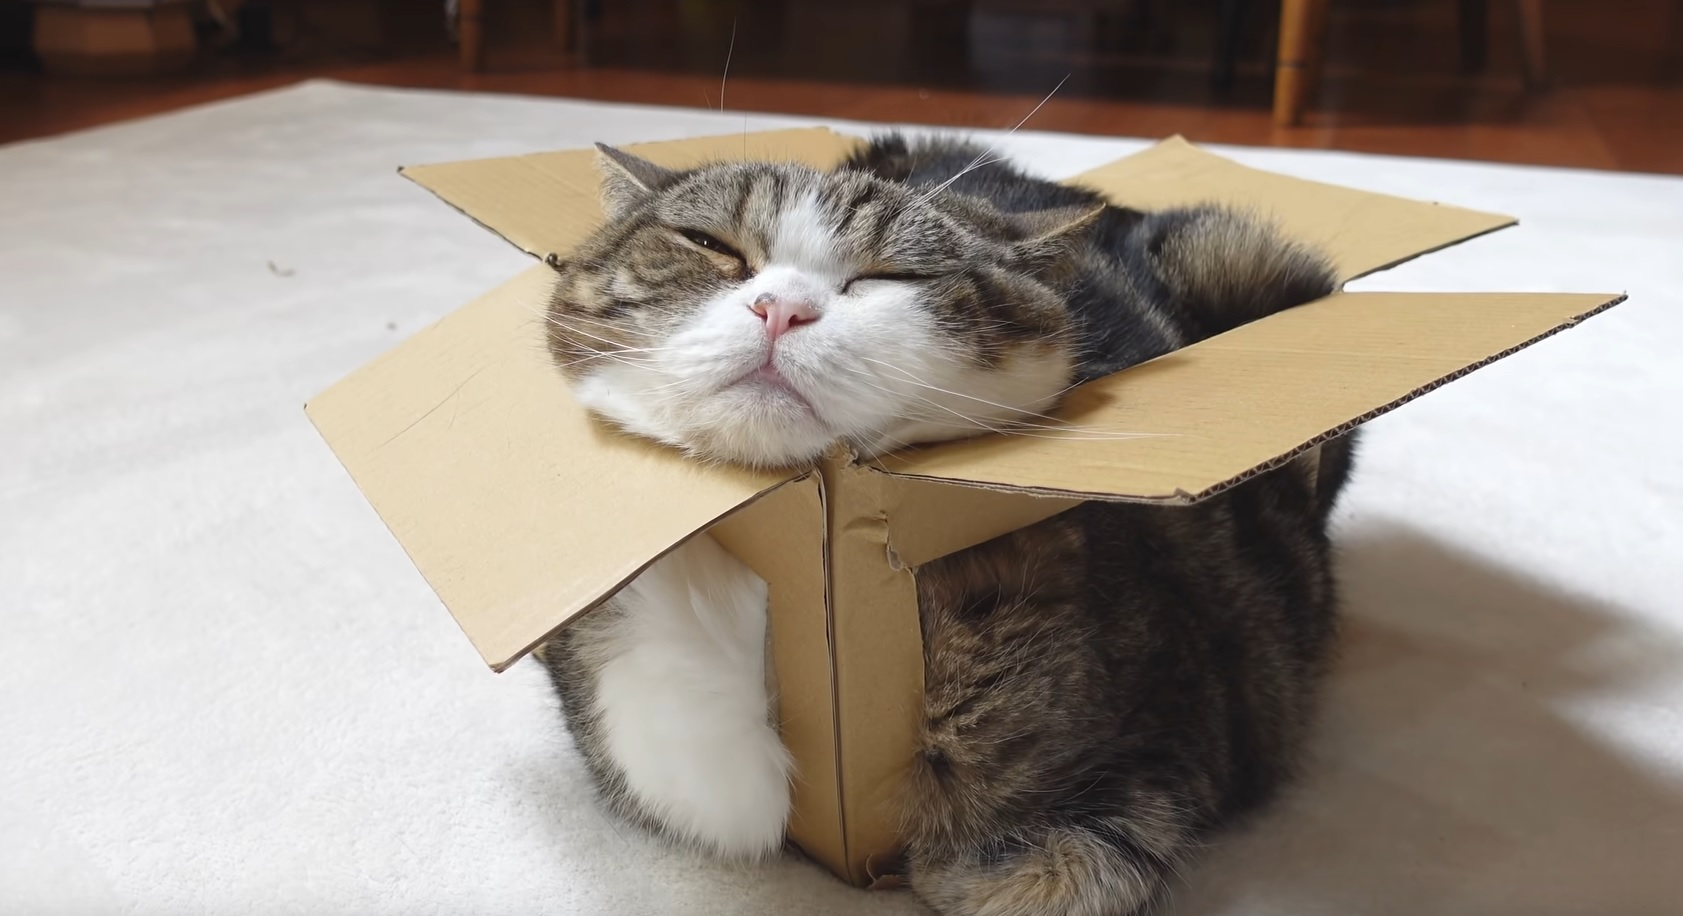 Maru And The Broken Box